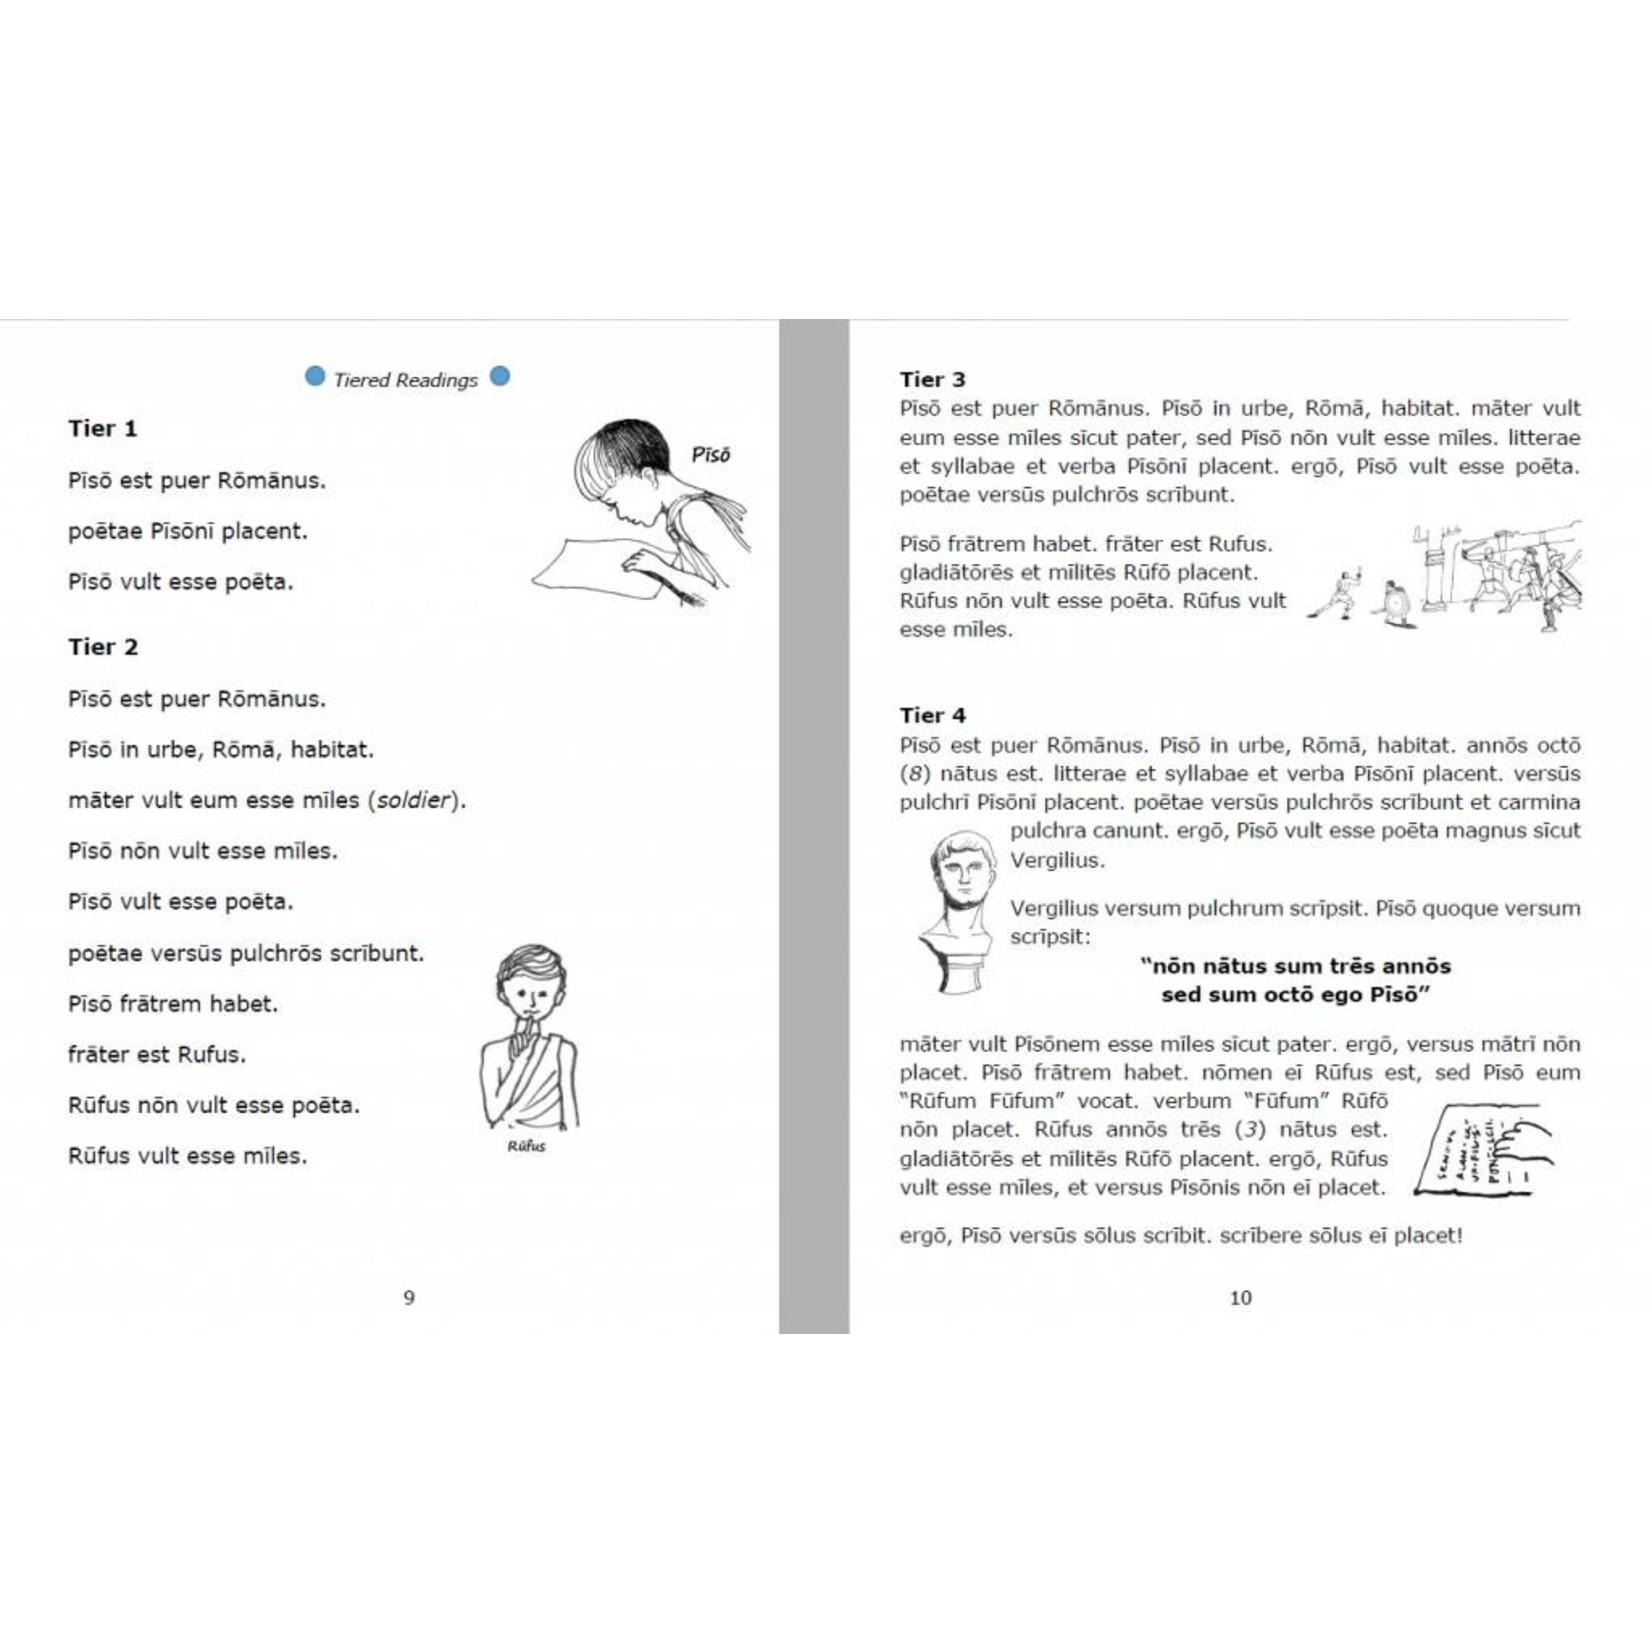 Magister P Pīsō Ille Poētulus - Werkboek